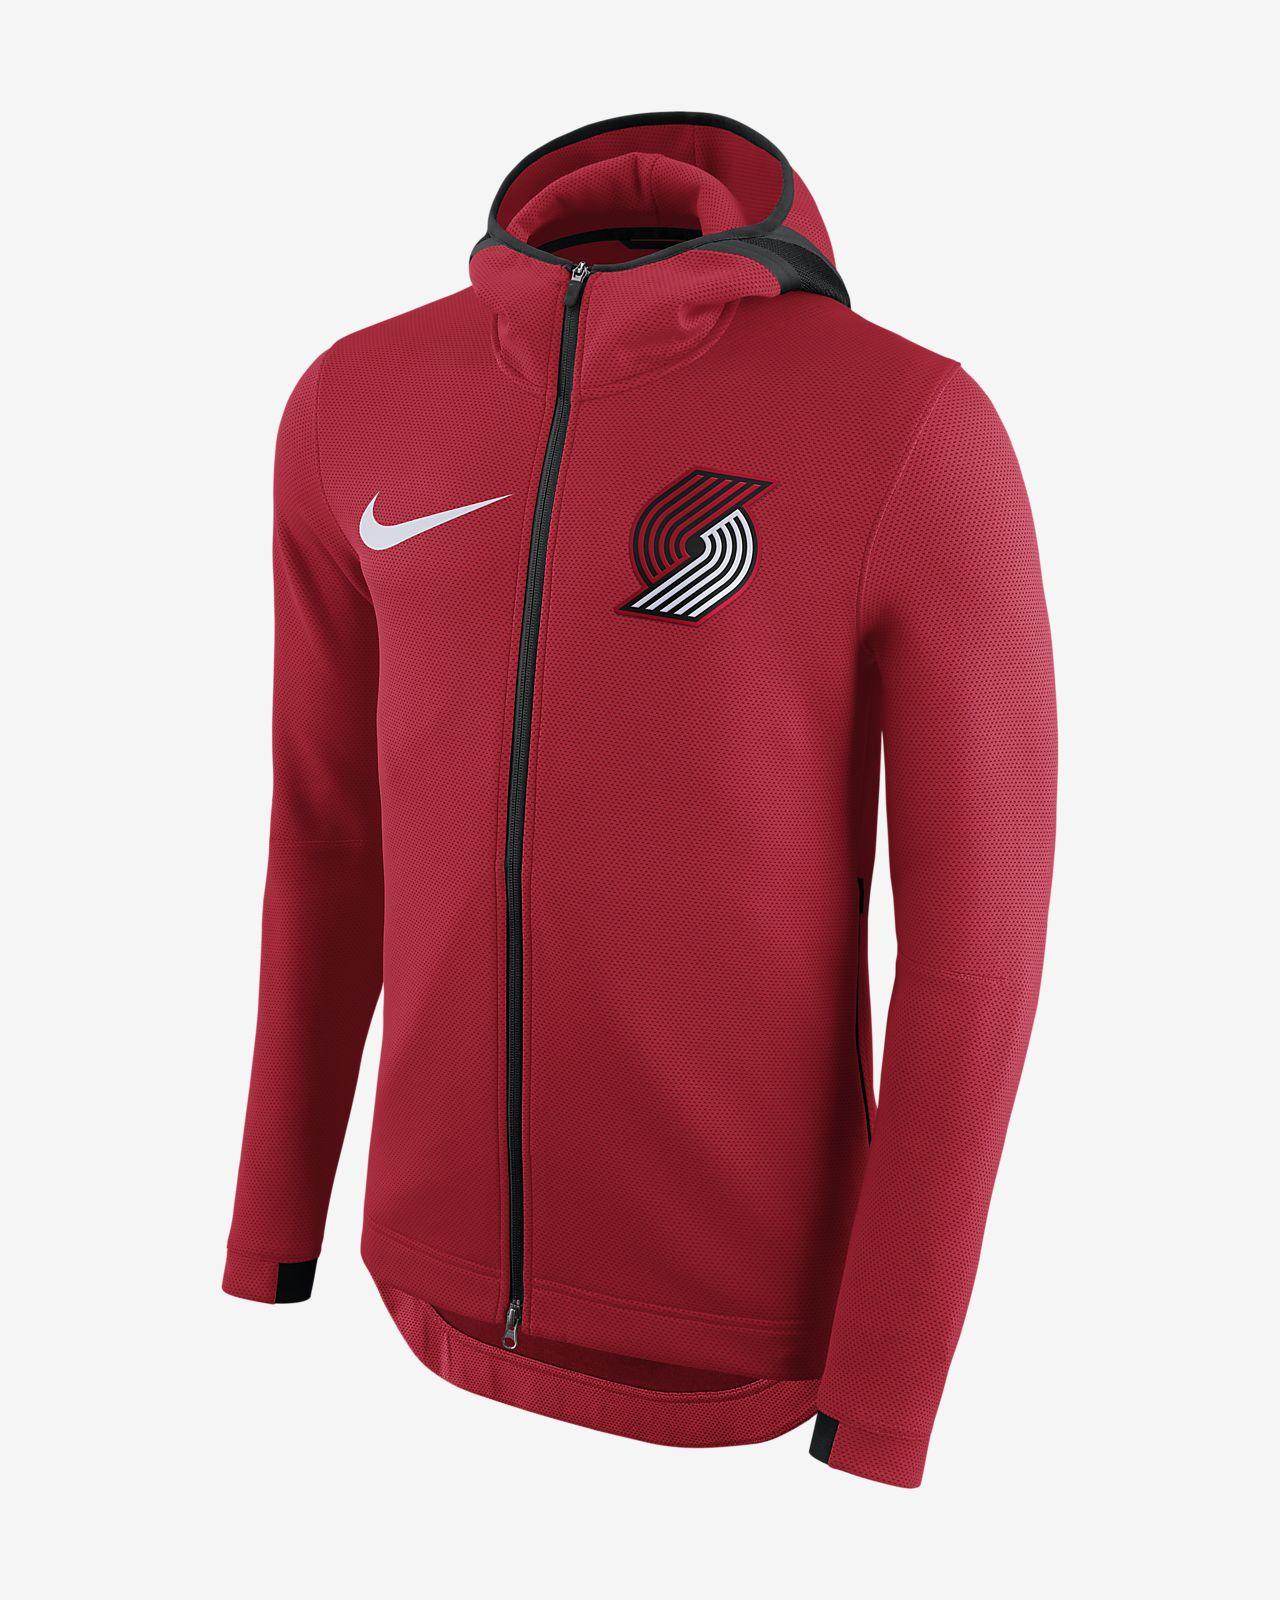 Portland Trail Blazers Nba: Portland Trail Blazers Nike Therma Flex Showtime Men's NBA